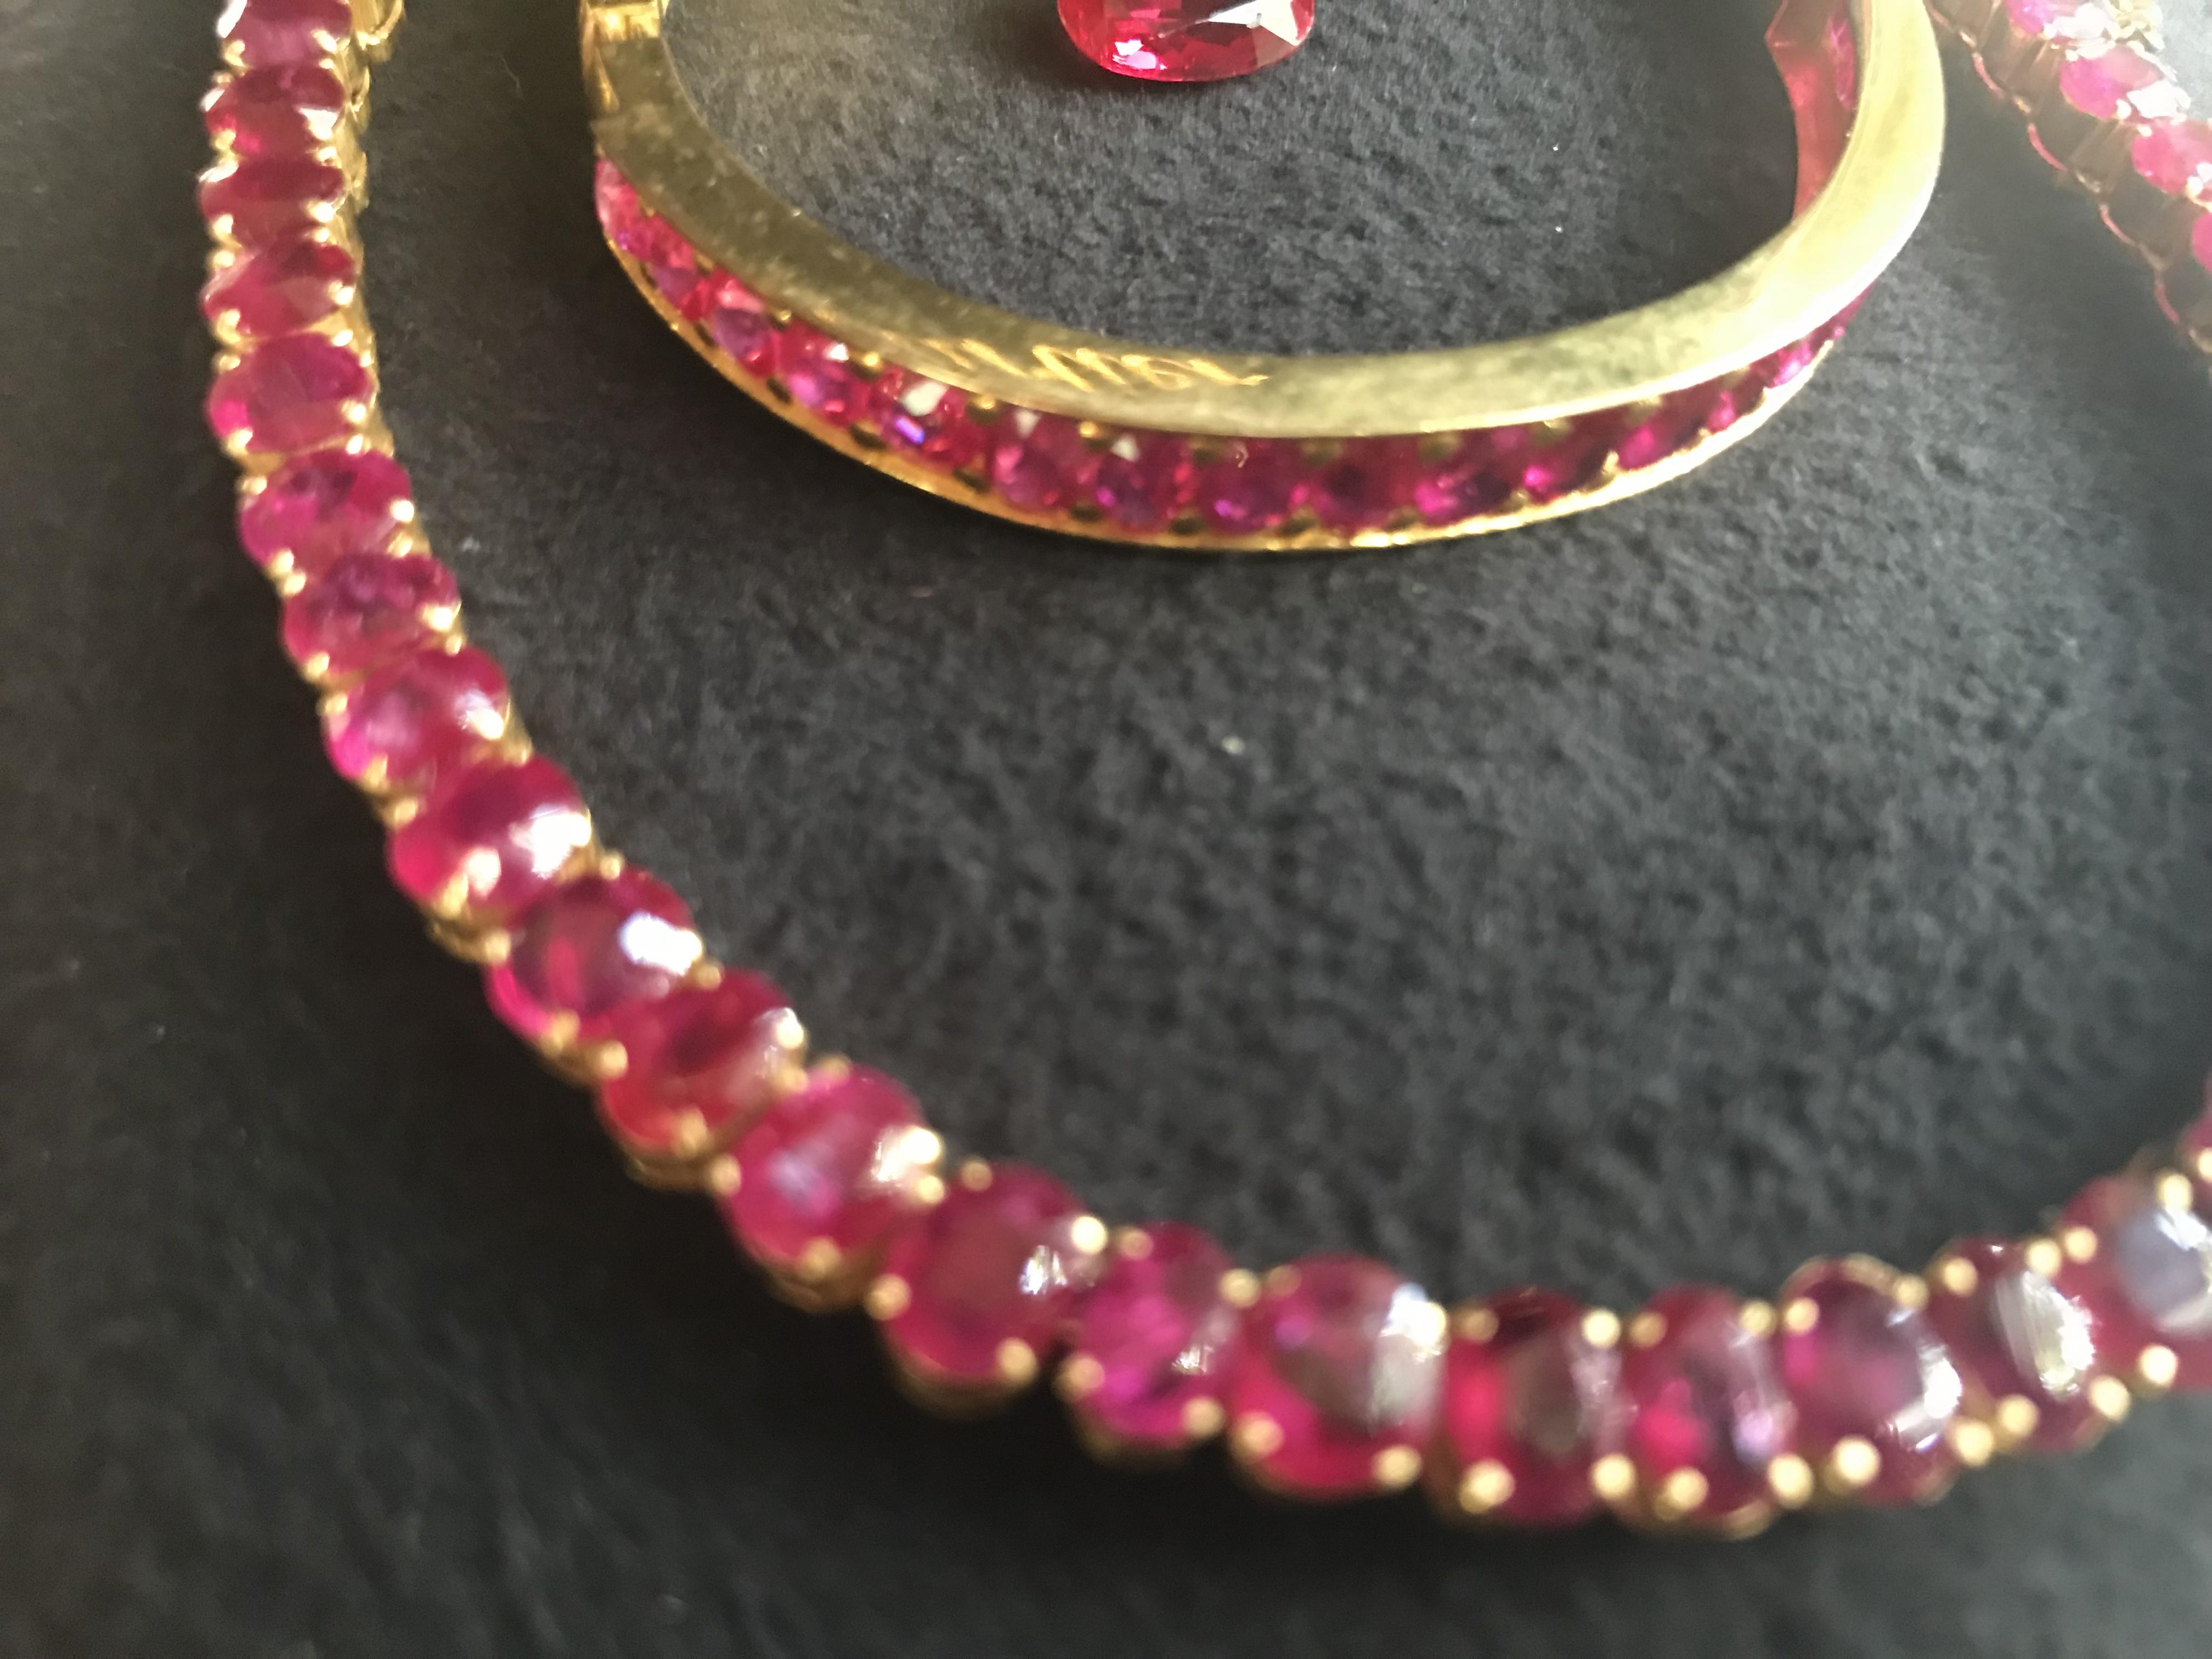 Looking forPrice - Inherited Natural Burma Ruby (Regin: Mogok) - Gem